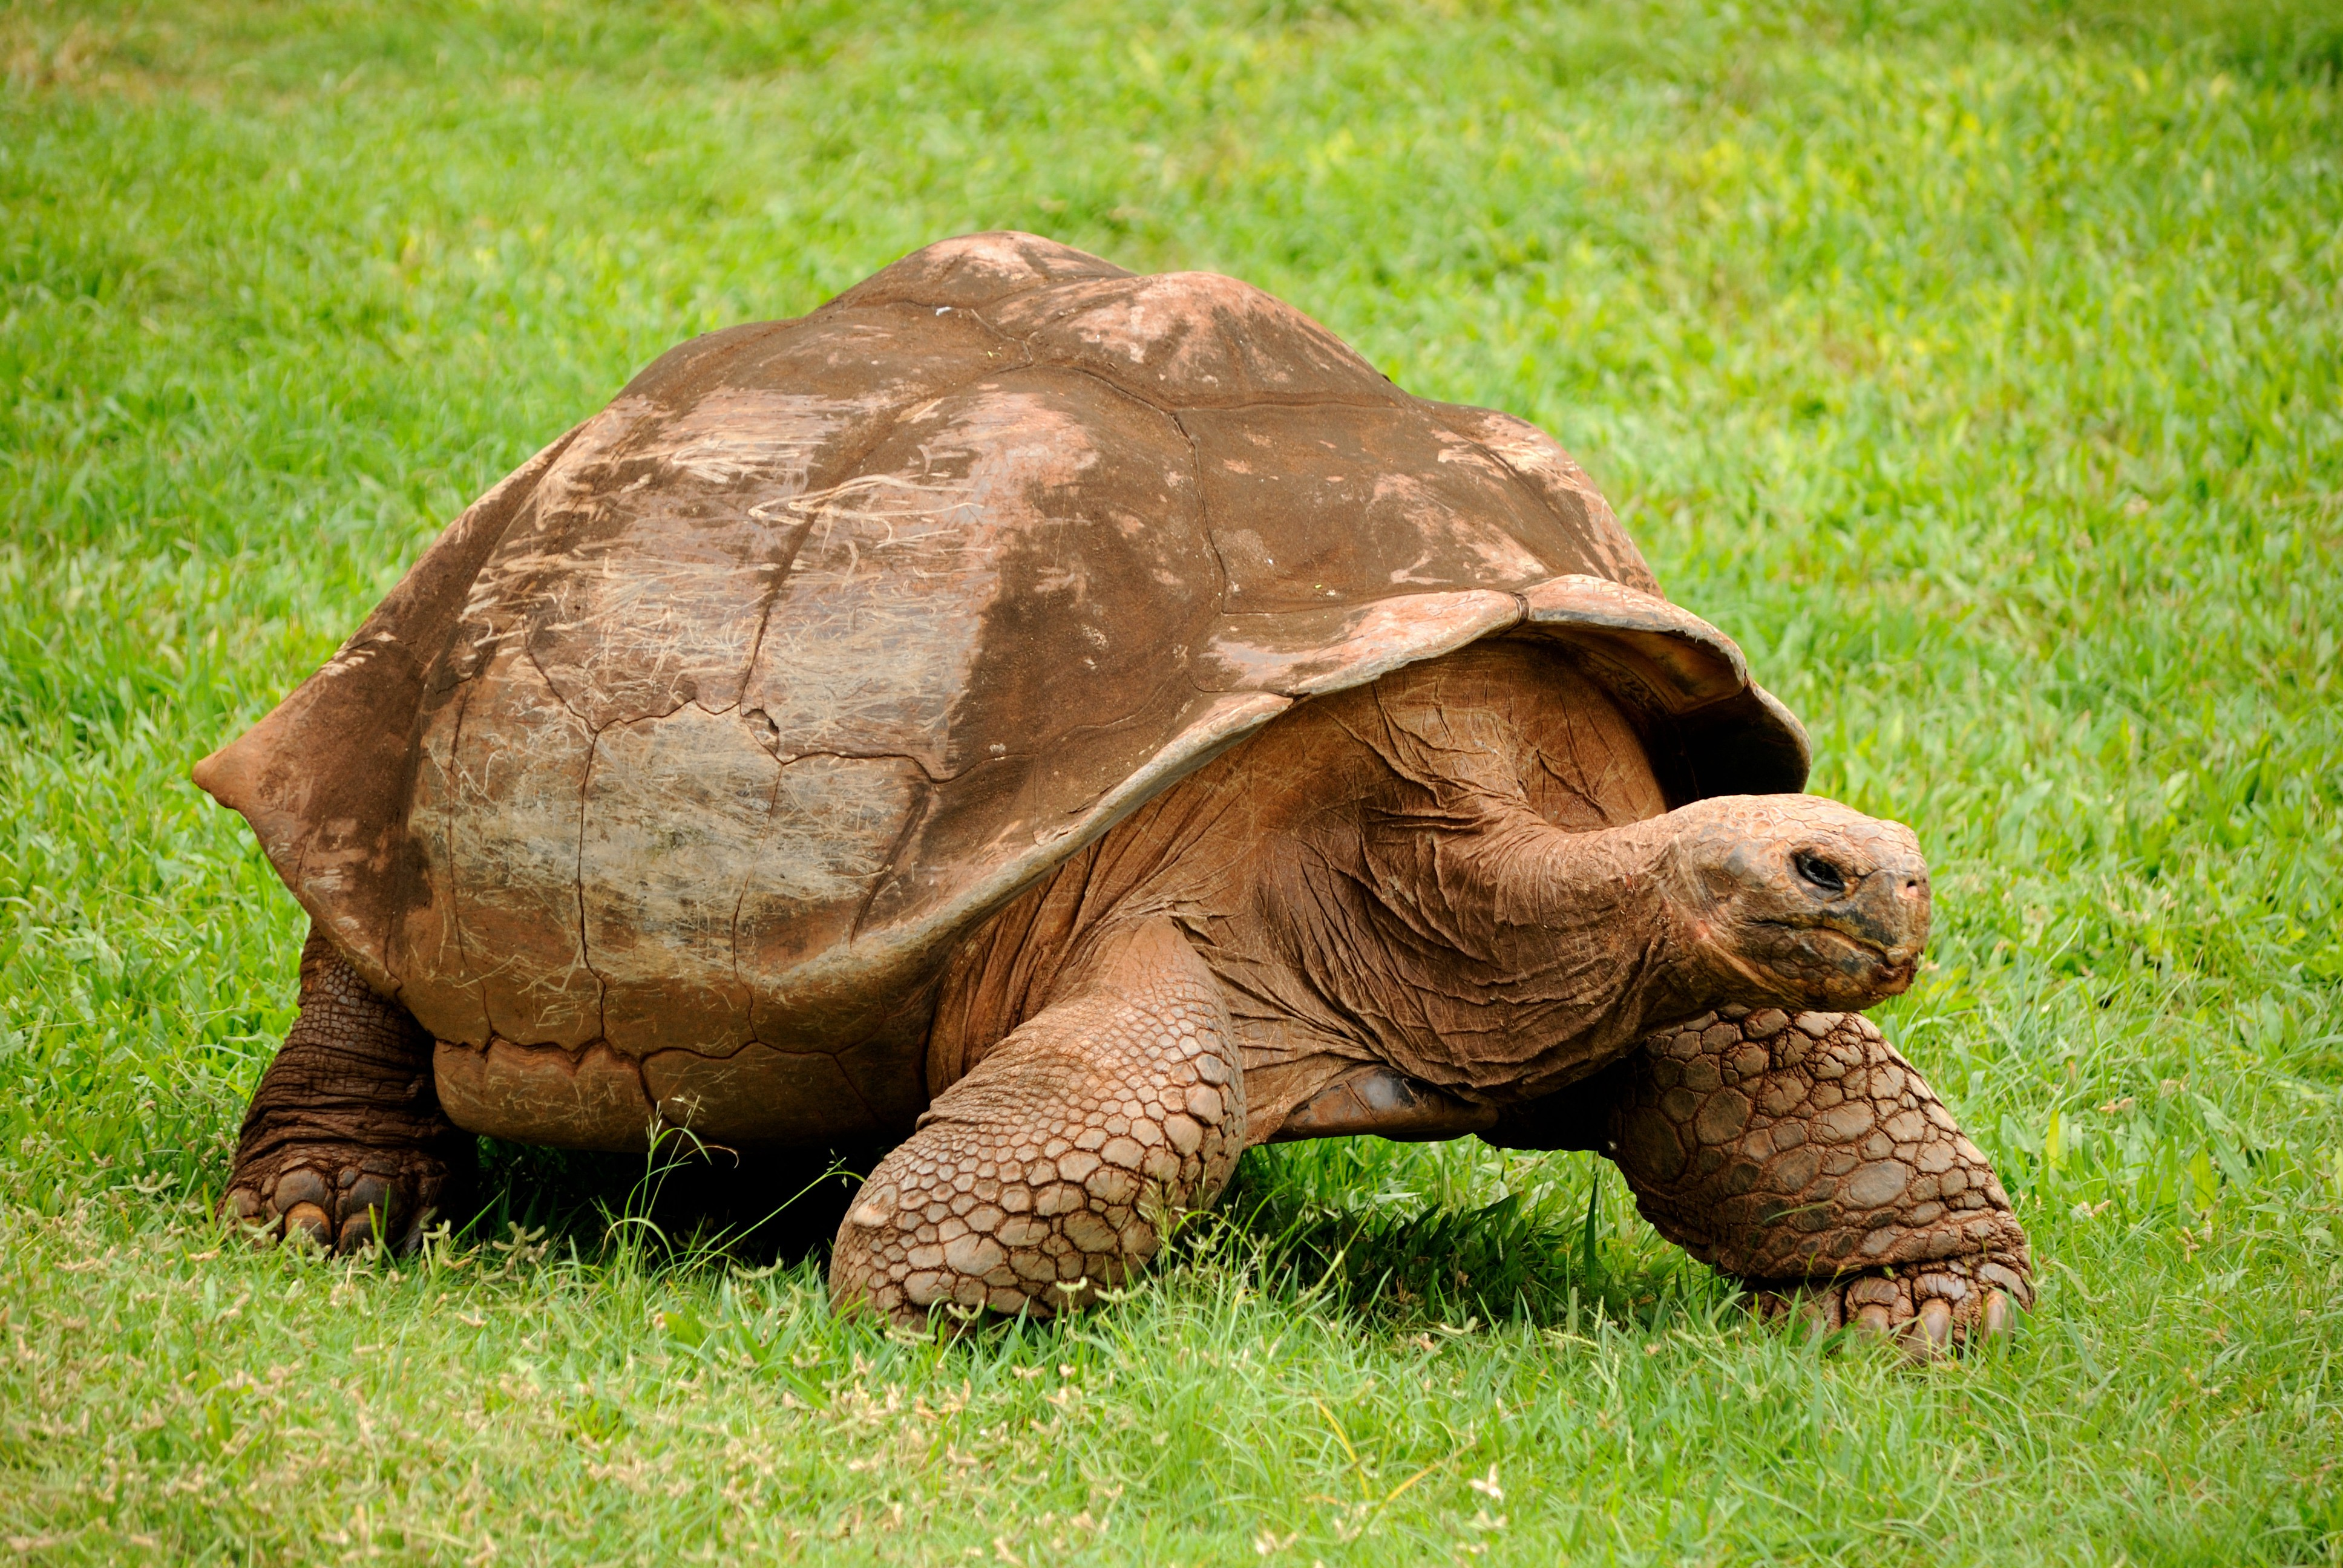 Tartaruga gigante de Galápagos (Foto: Daniel Ramirez/Wikimedia Commons)